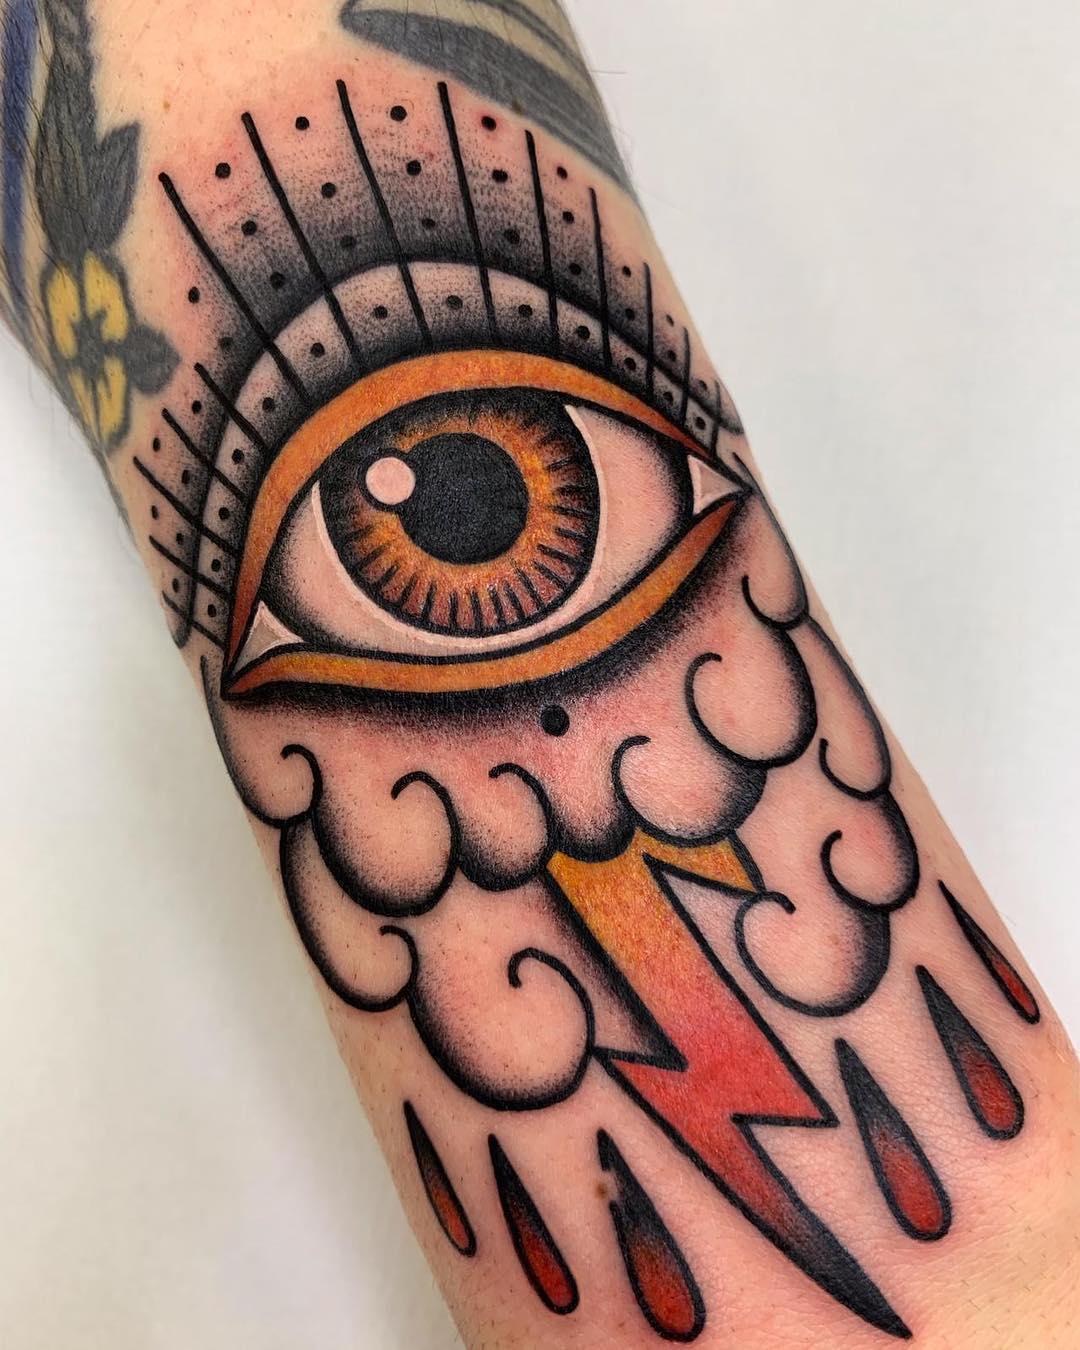 tatuagem old school masculino colorida preta no braço